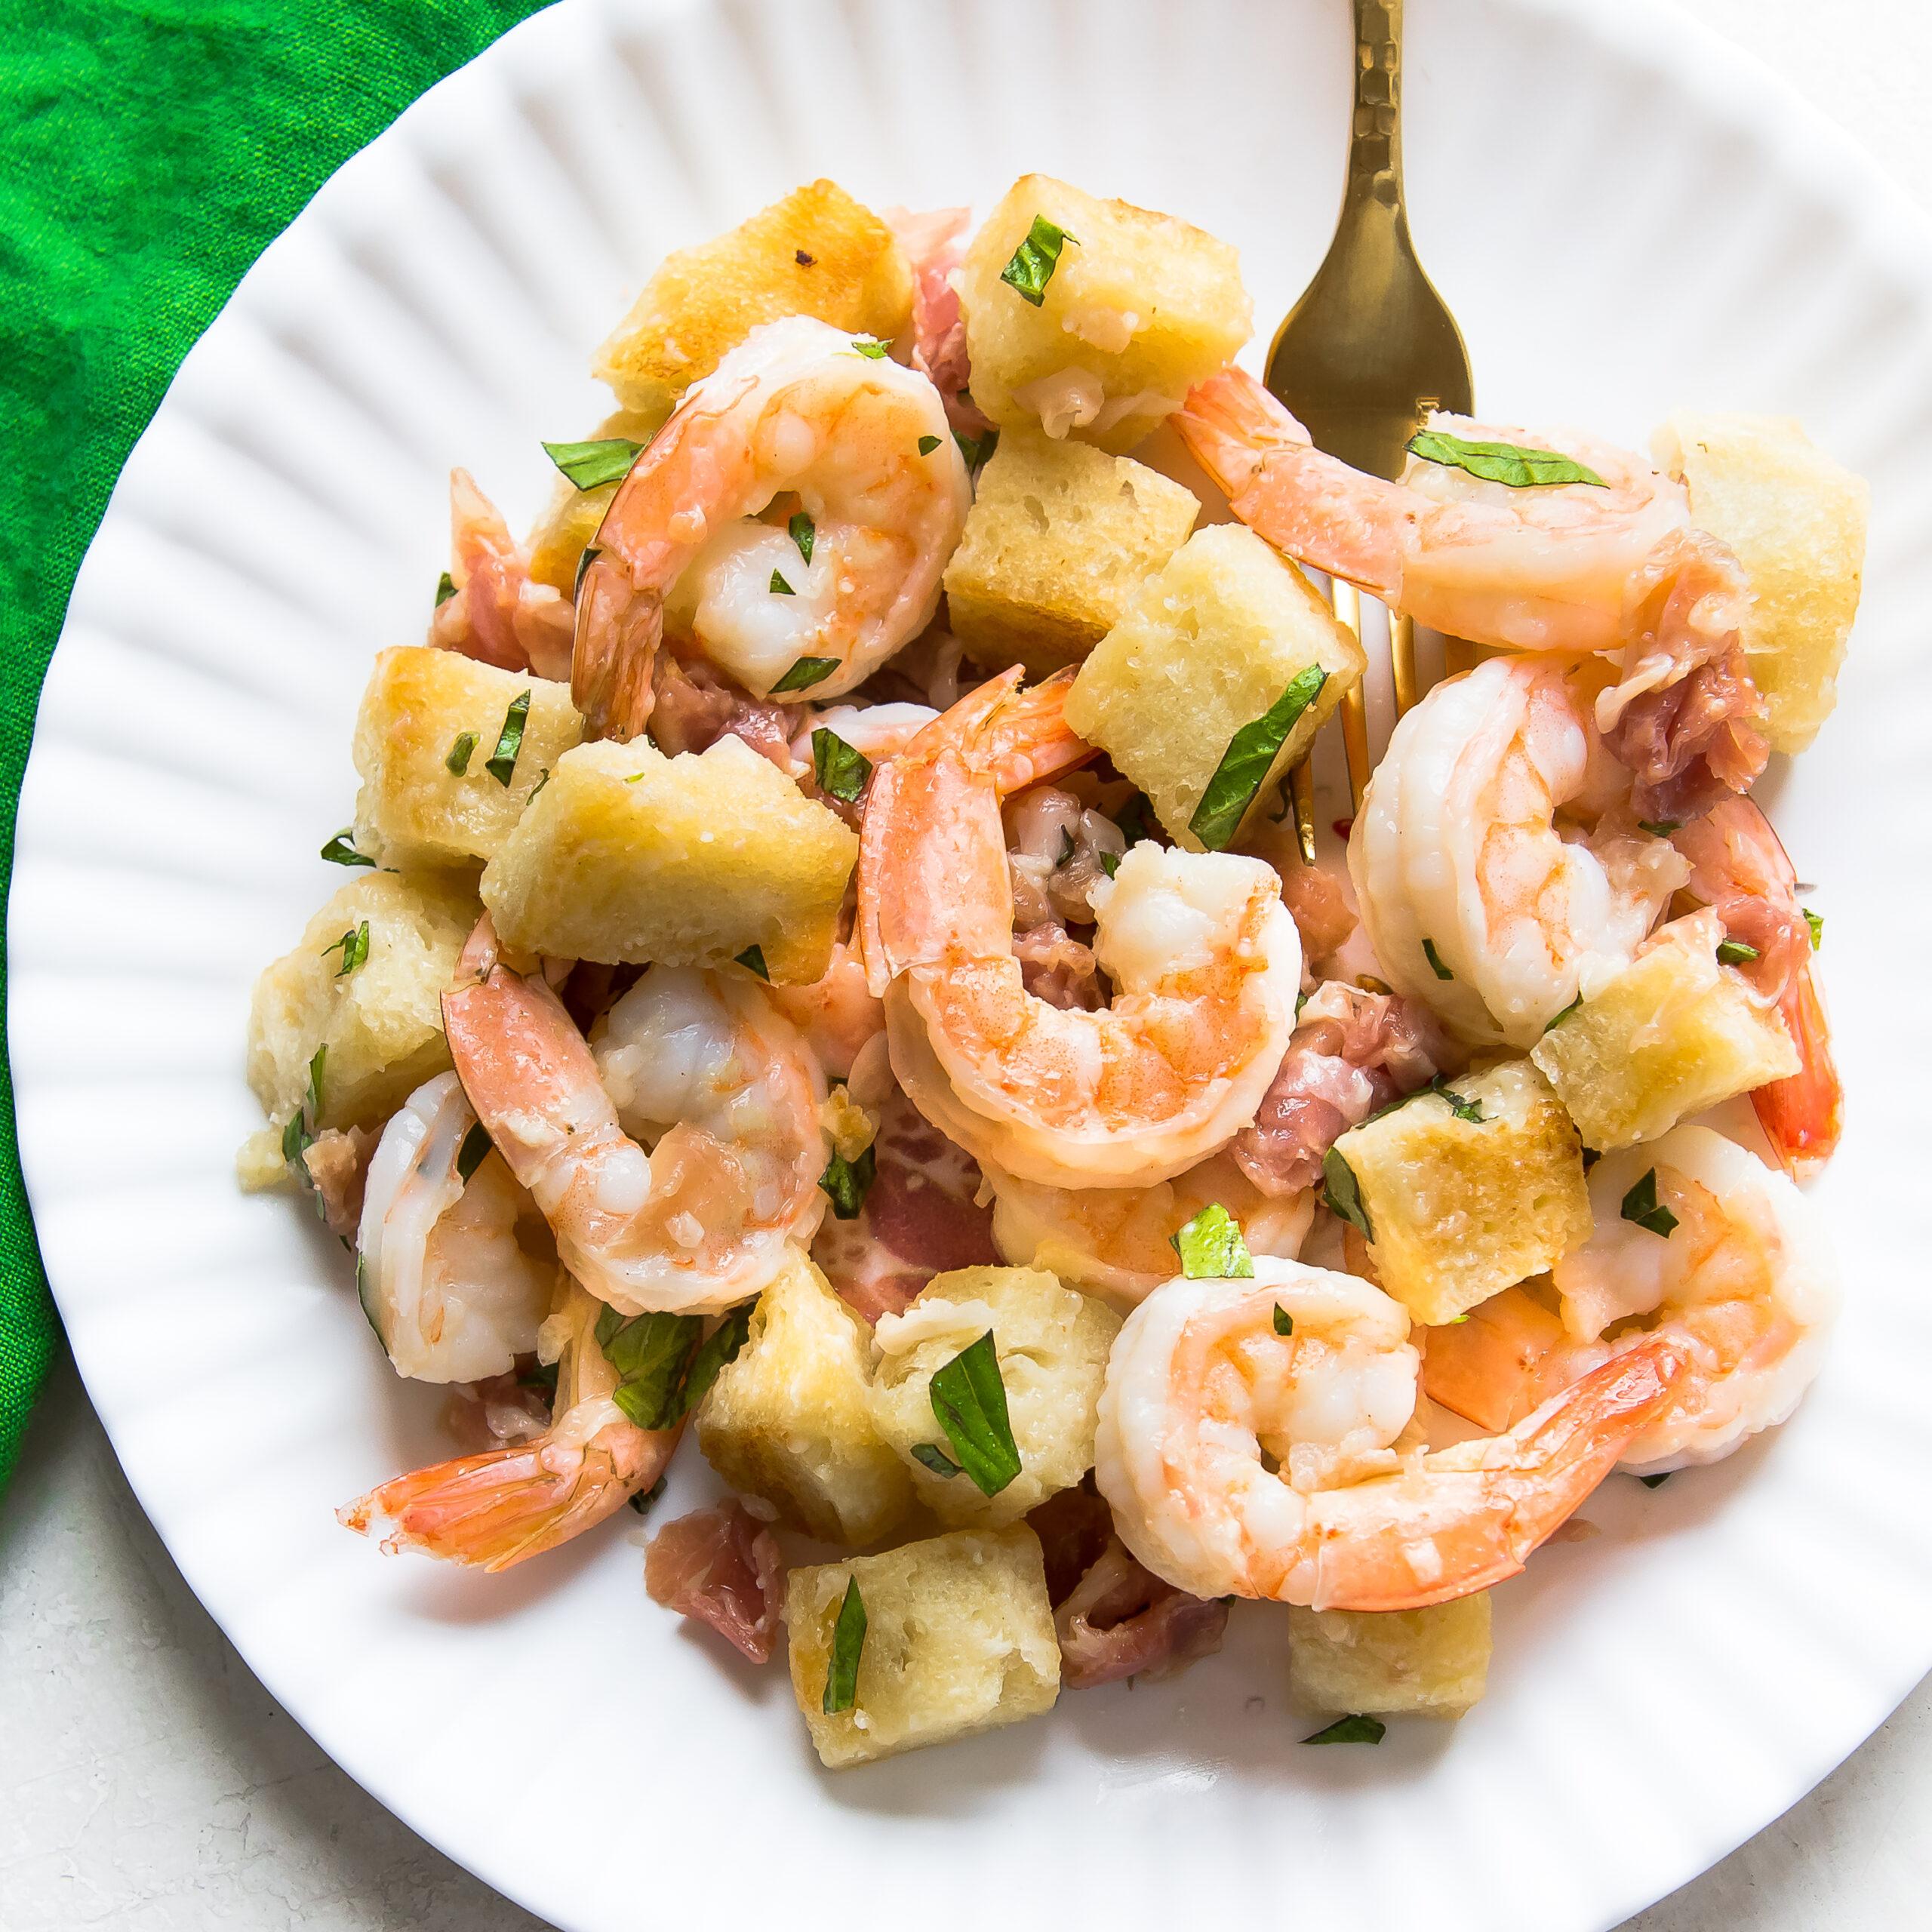 Shrimp and Prosciutto Salad 1×1 (1 of 1)